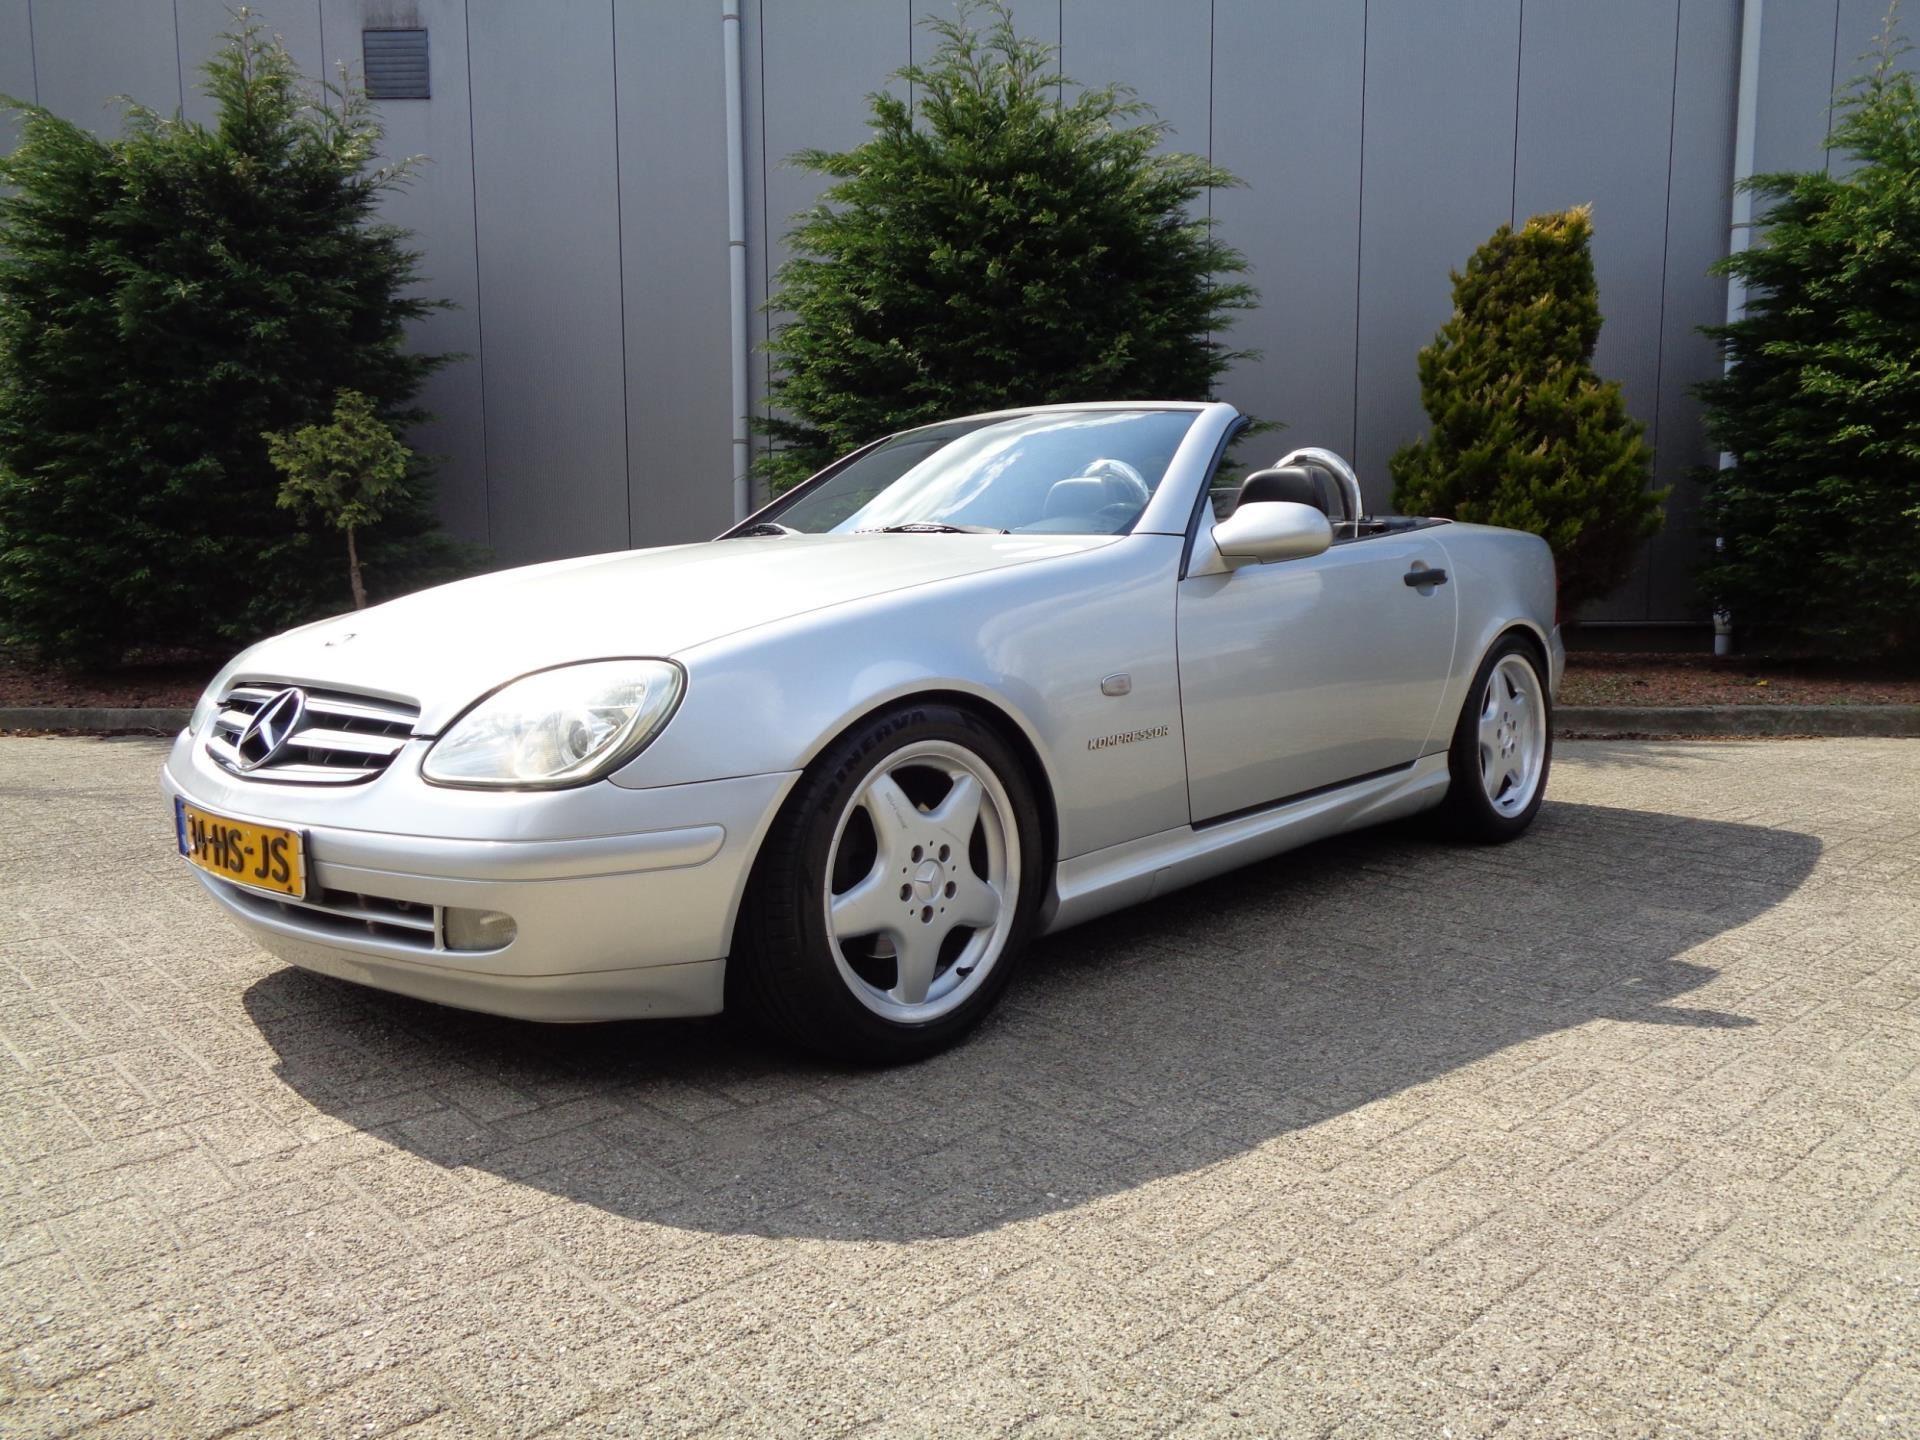 Mercedes-Benz SLK-klasse occasion - autobedrijf LO WOLTERS vof.